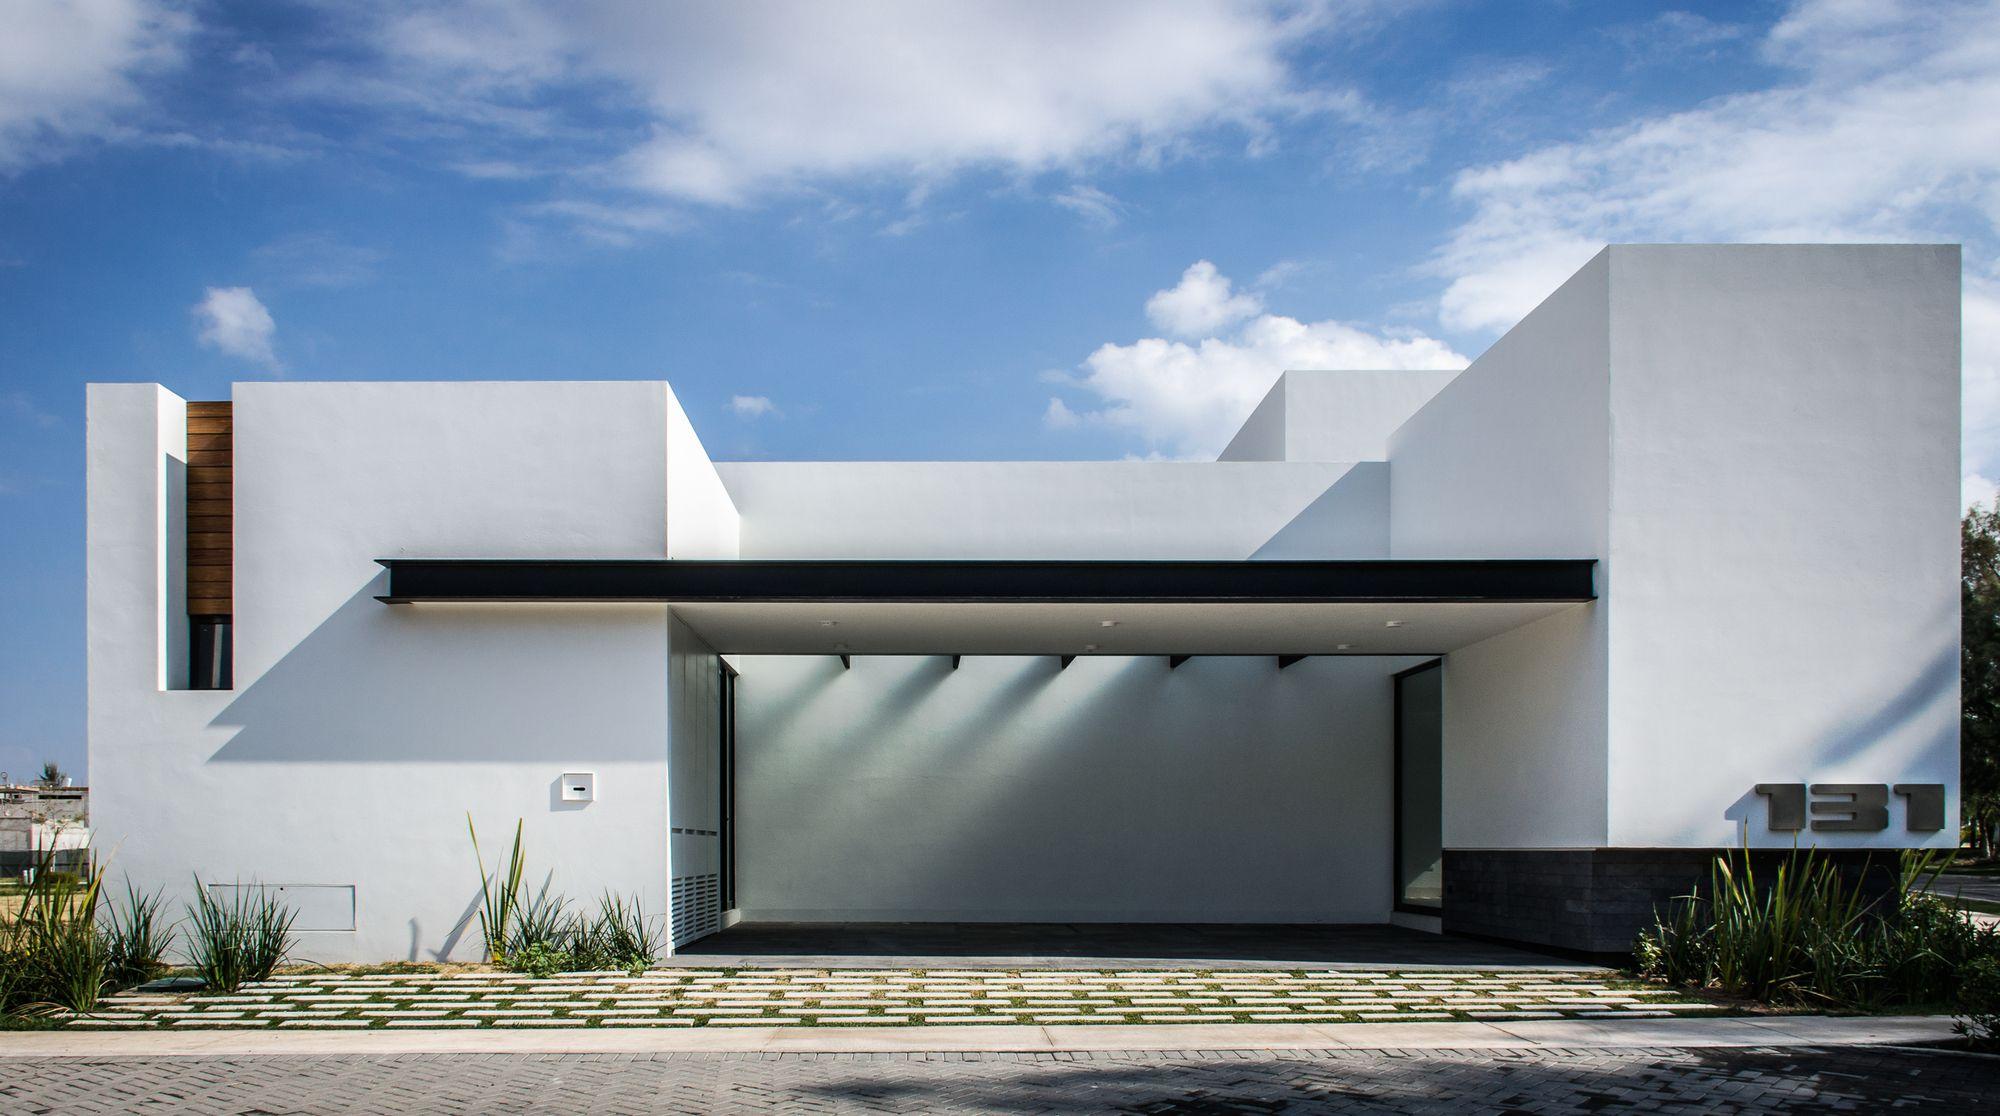 Galer a de casa agr adi arquitectura y dise o interior Arquitectura y diseno de casas modernas